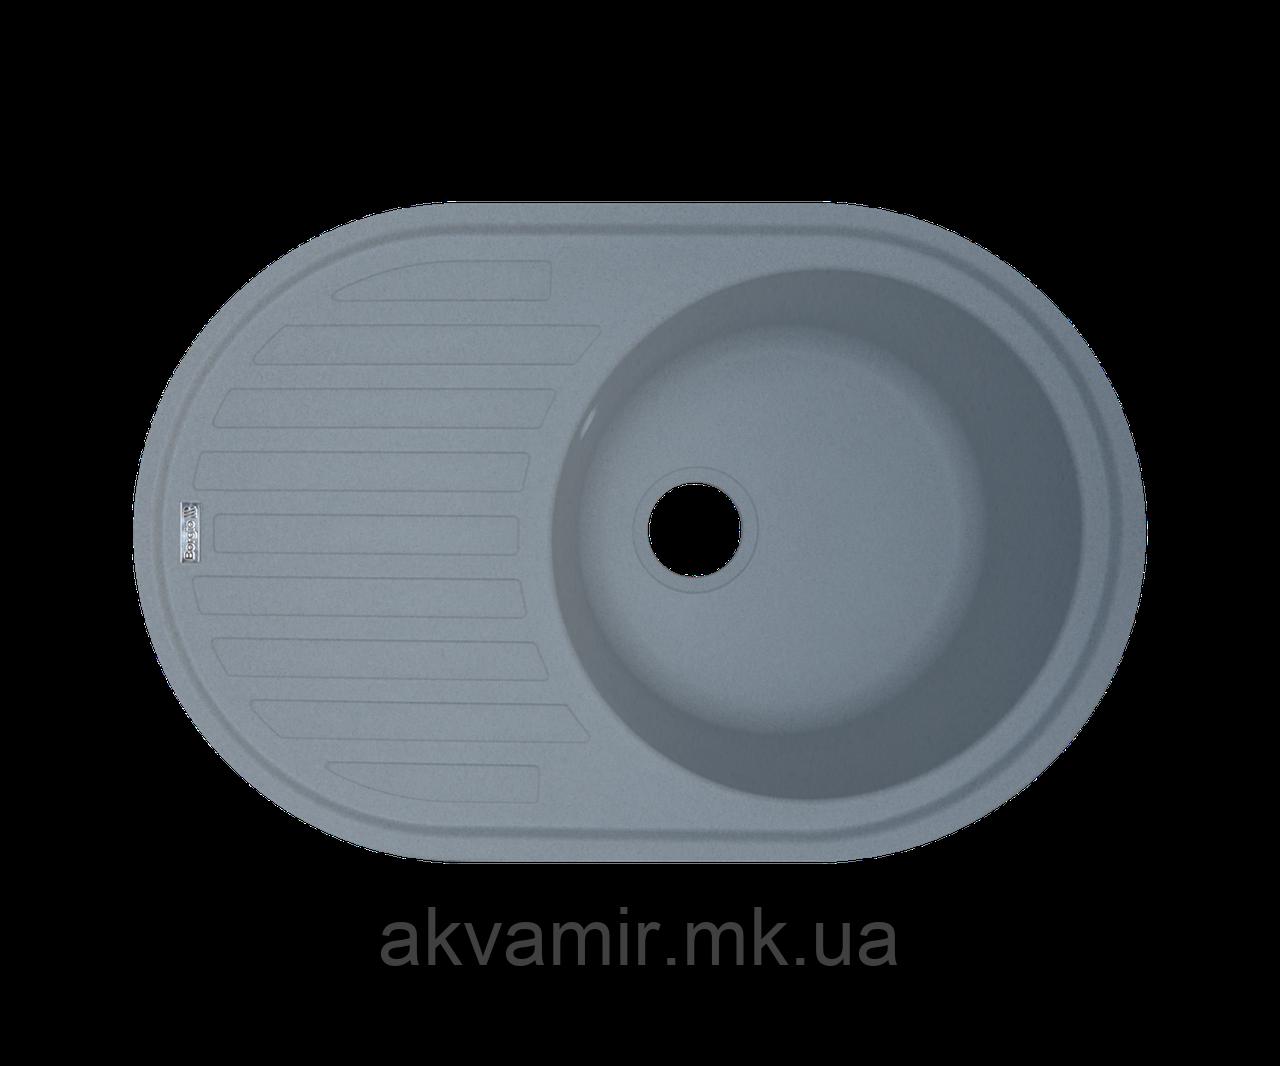 Кухонная мойка Borgio (гранит) OVM-770x500 (серый металлик)